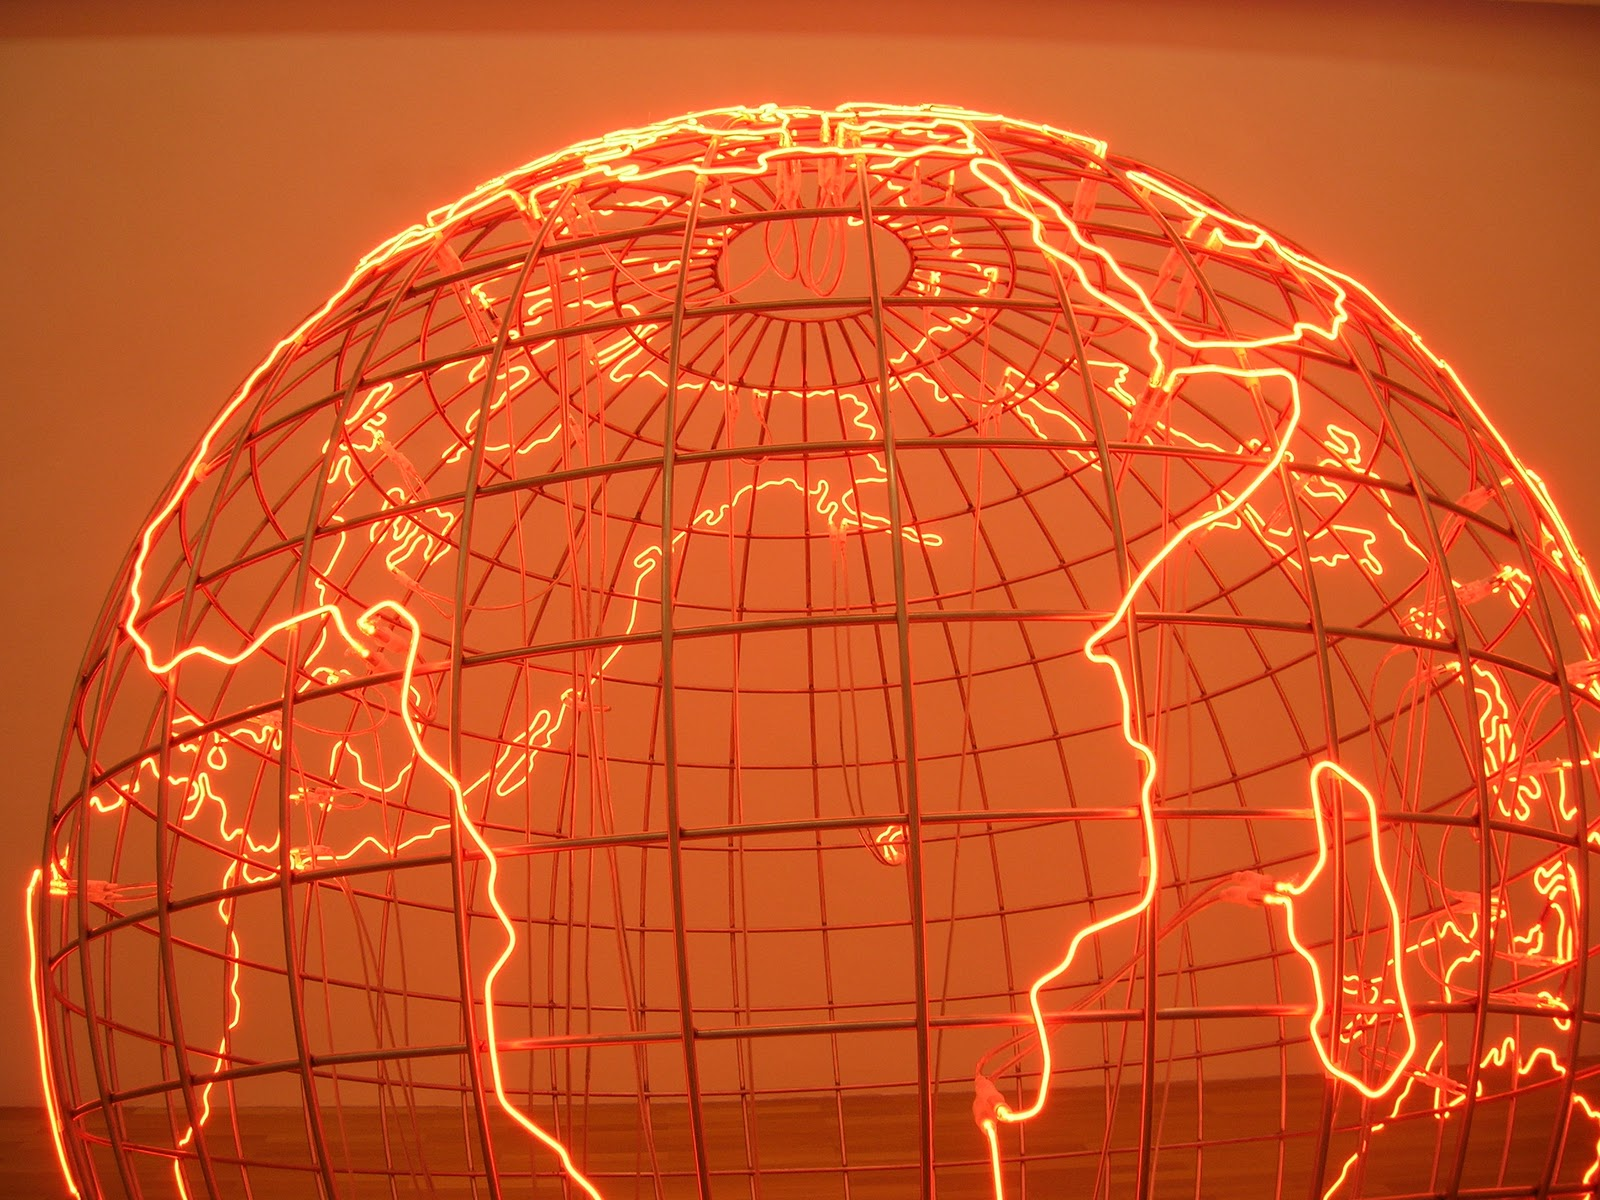 Neonneon Mona Hatoum S Hot Spot At The Goetz Collection